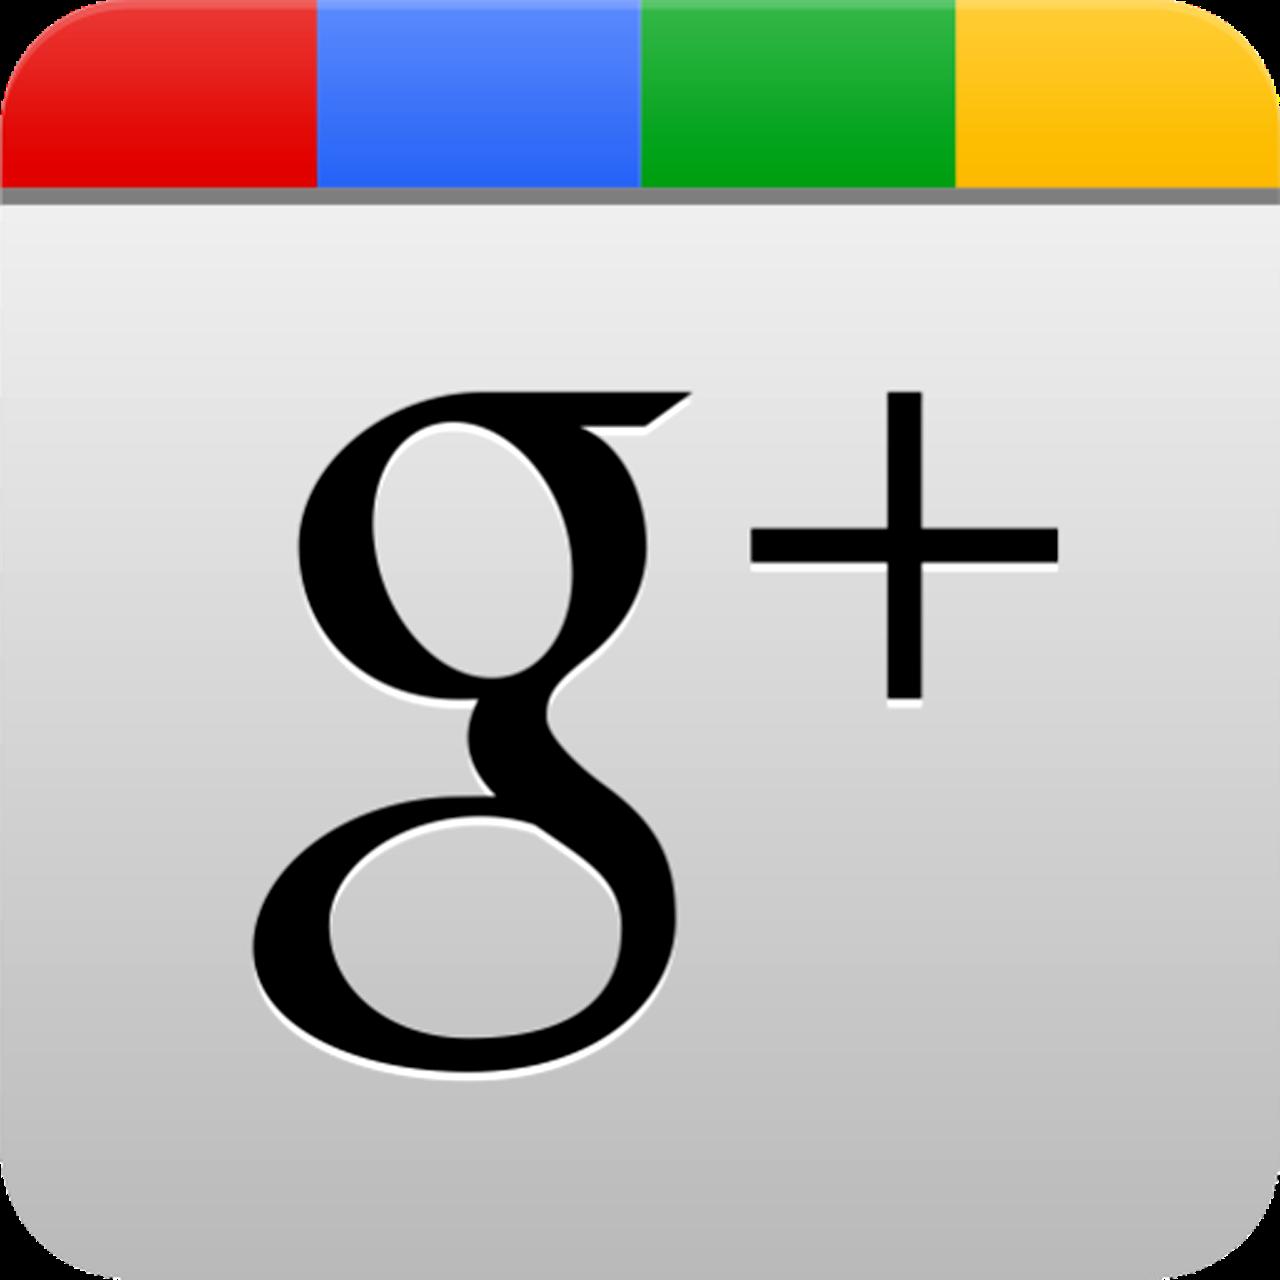 Google Plus g+ HD Logo Wallpaper Download Free Wallpapers in HD for your Desktop